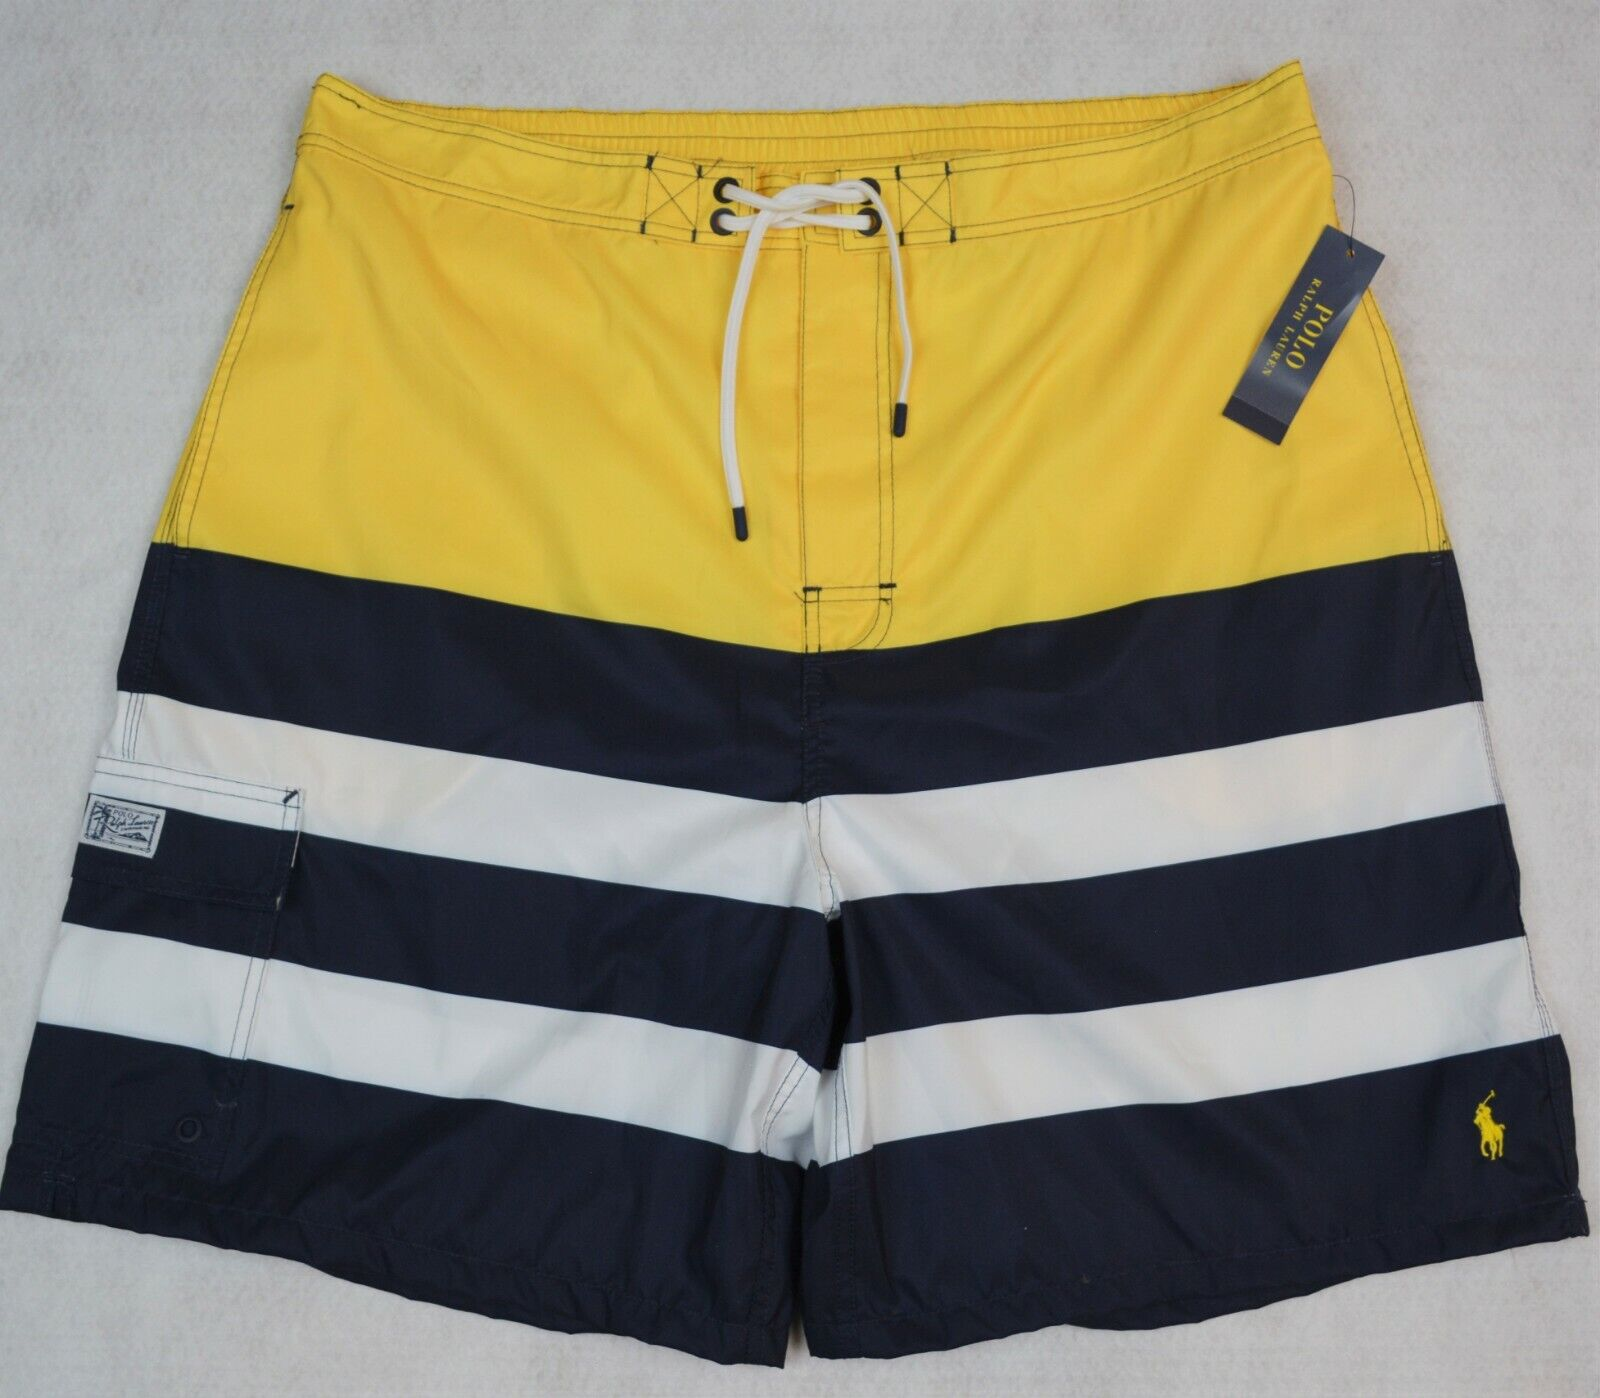 Polo Ralph Lauren Swim Trunks Board Shorts bluee Size 3XB 3X NWT